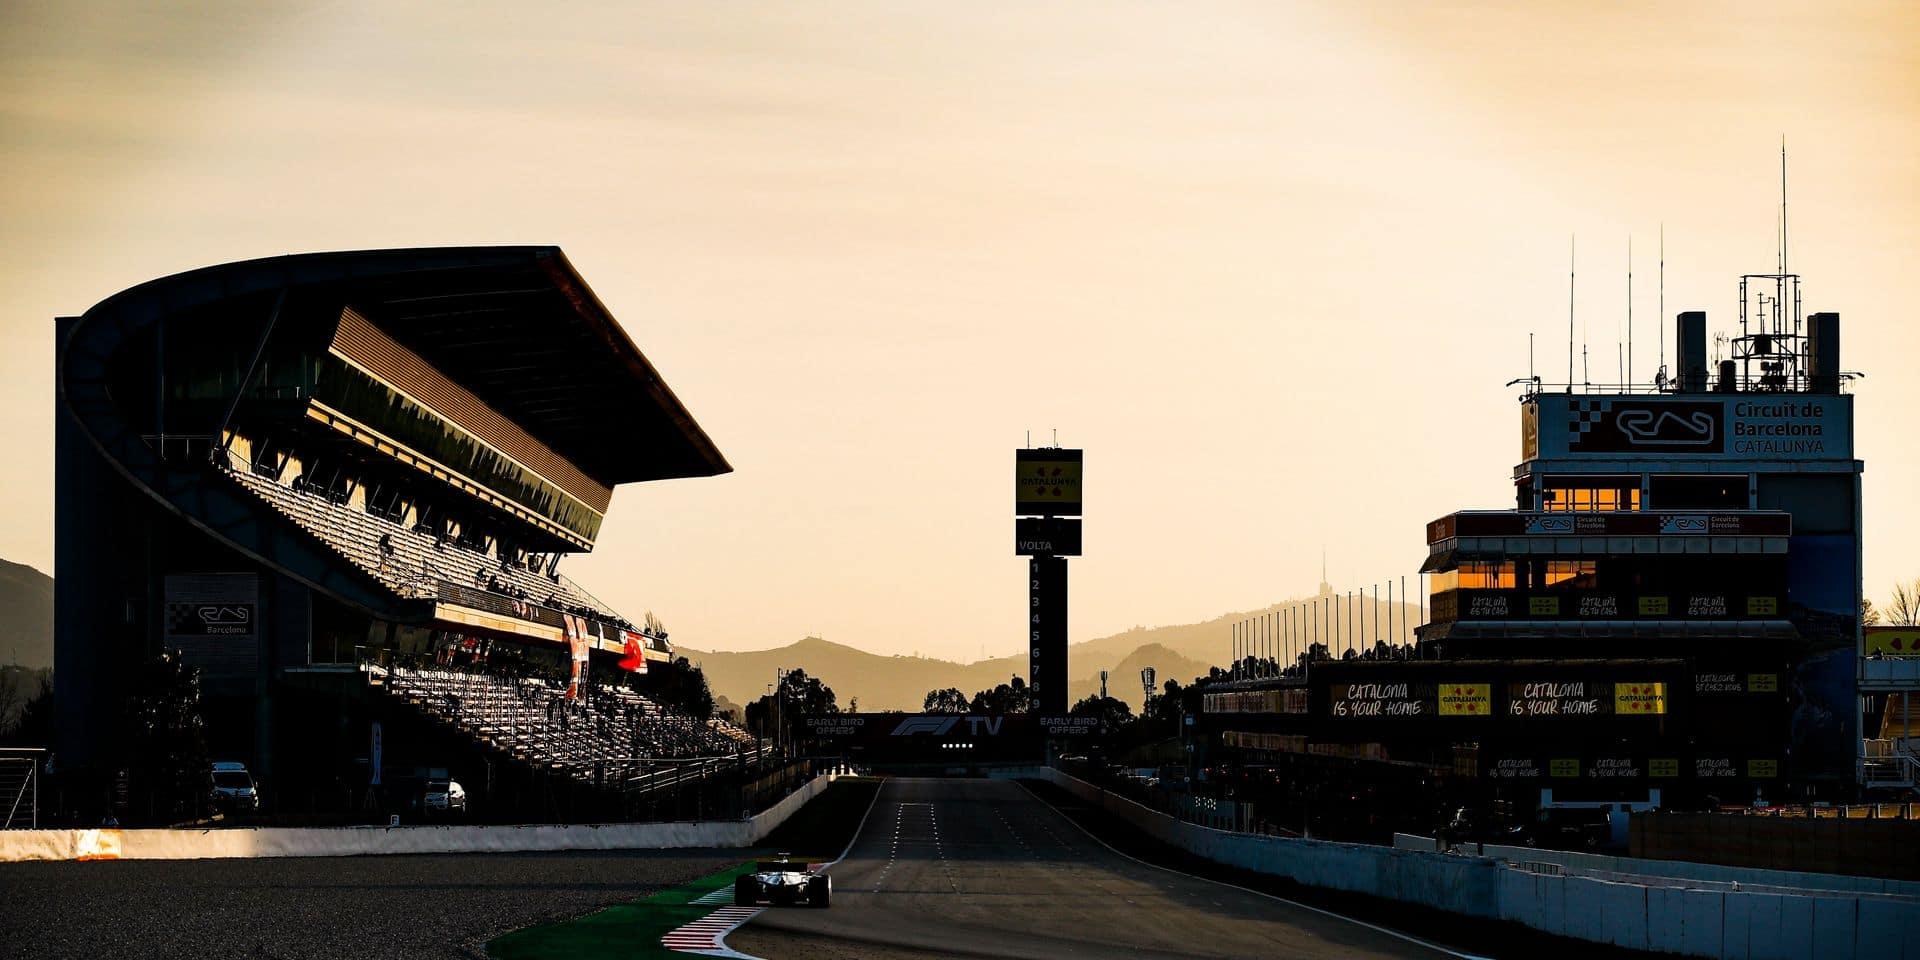 Motorsports: FIA Formula One World Championship 2020, Preseason Testing in Barcelona